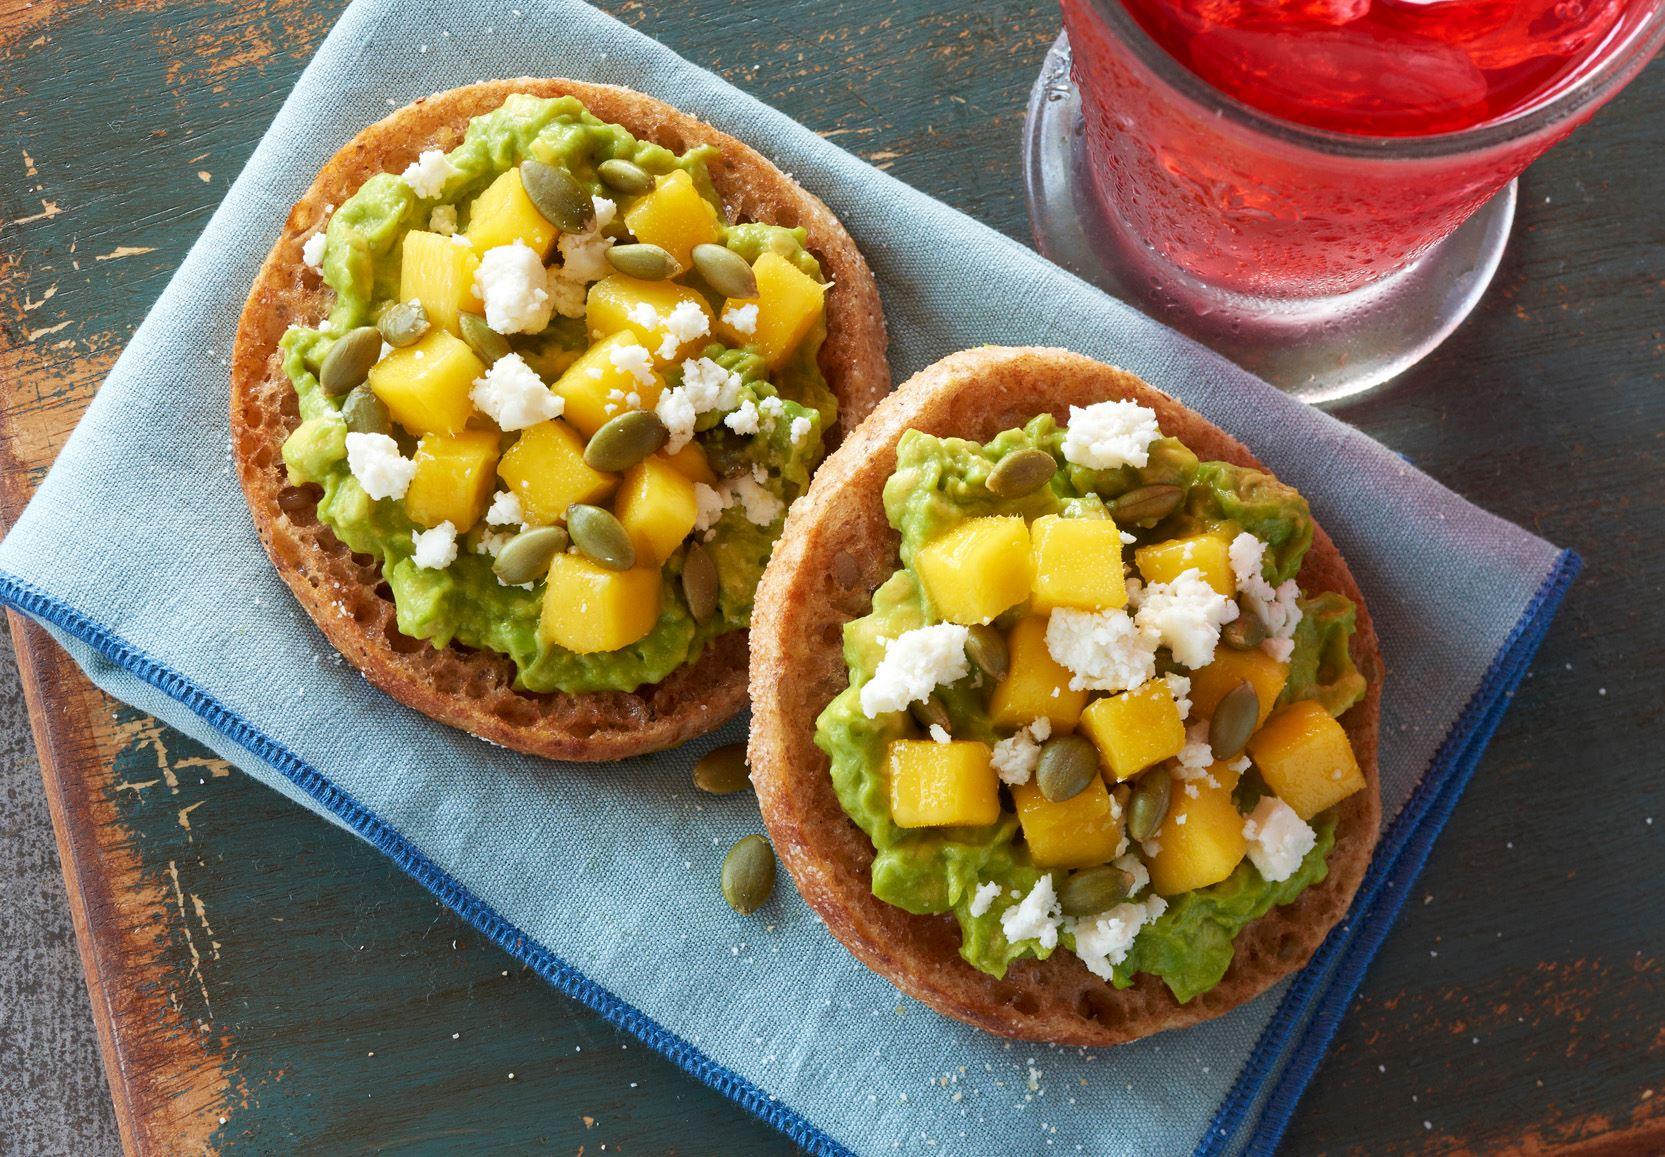 Bays Avocado Mango Smear with Pepitas